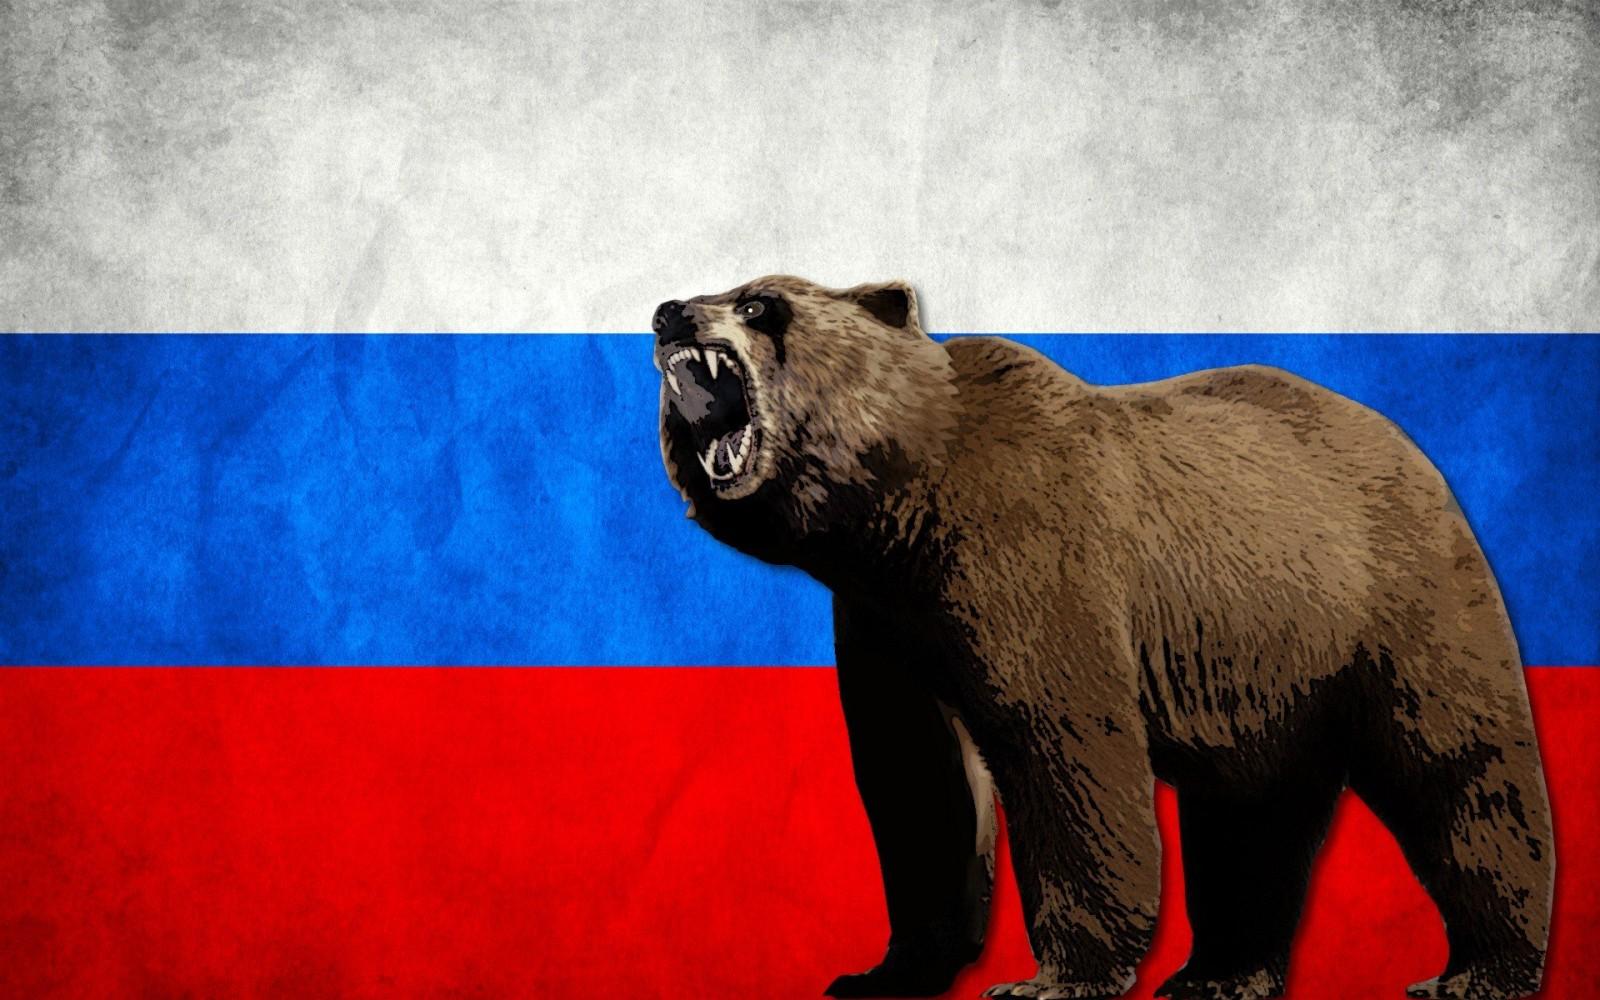 1920x1200_px_bears_Flag_russia_Russian-1203773.jpg!d.jpeg